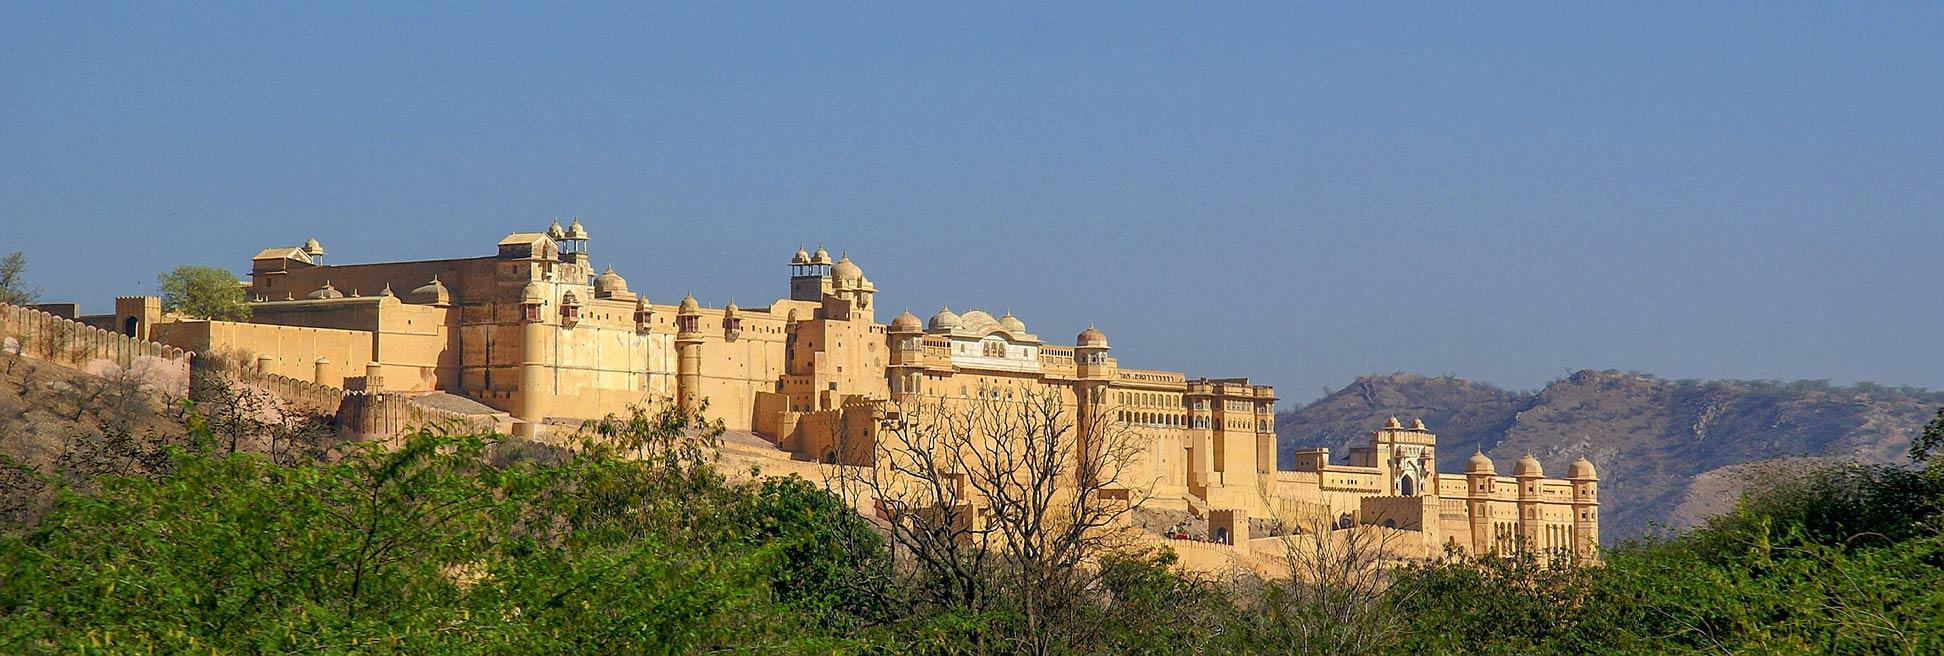 Amer Fort in Jaipur Rajasthan India Google